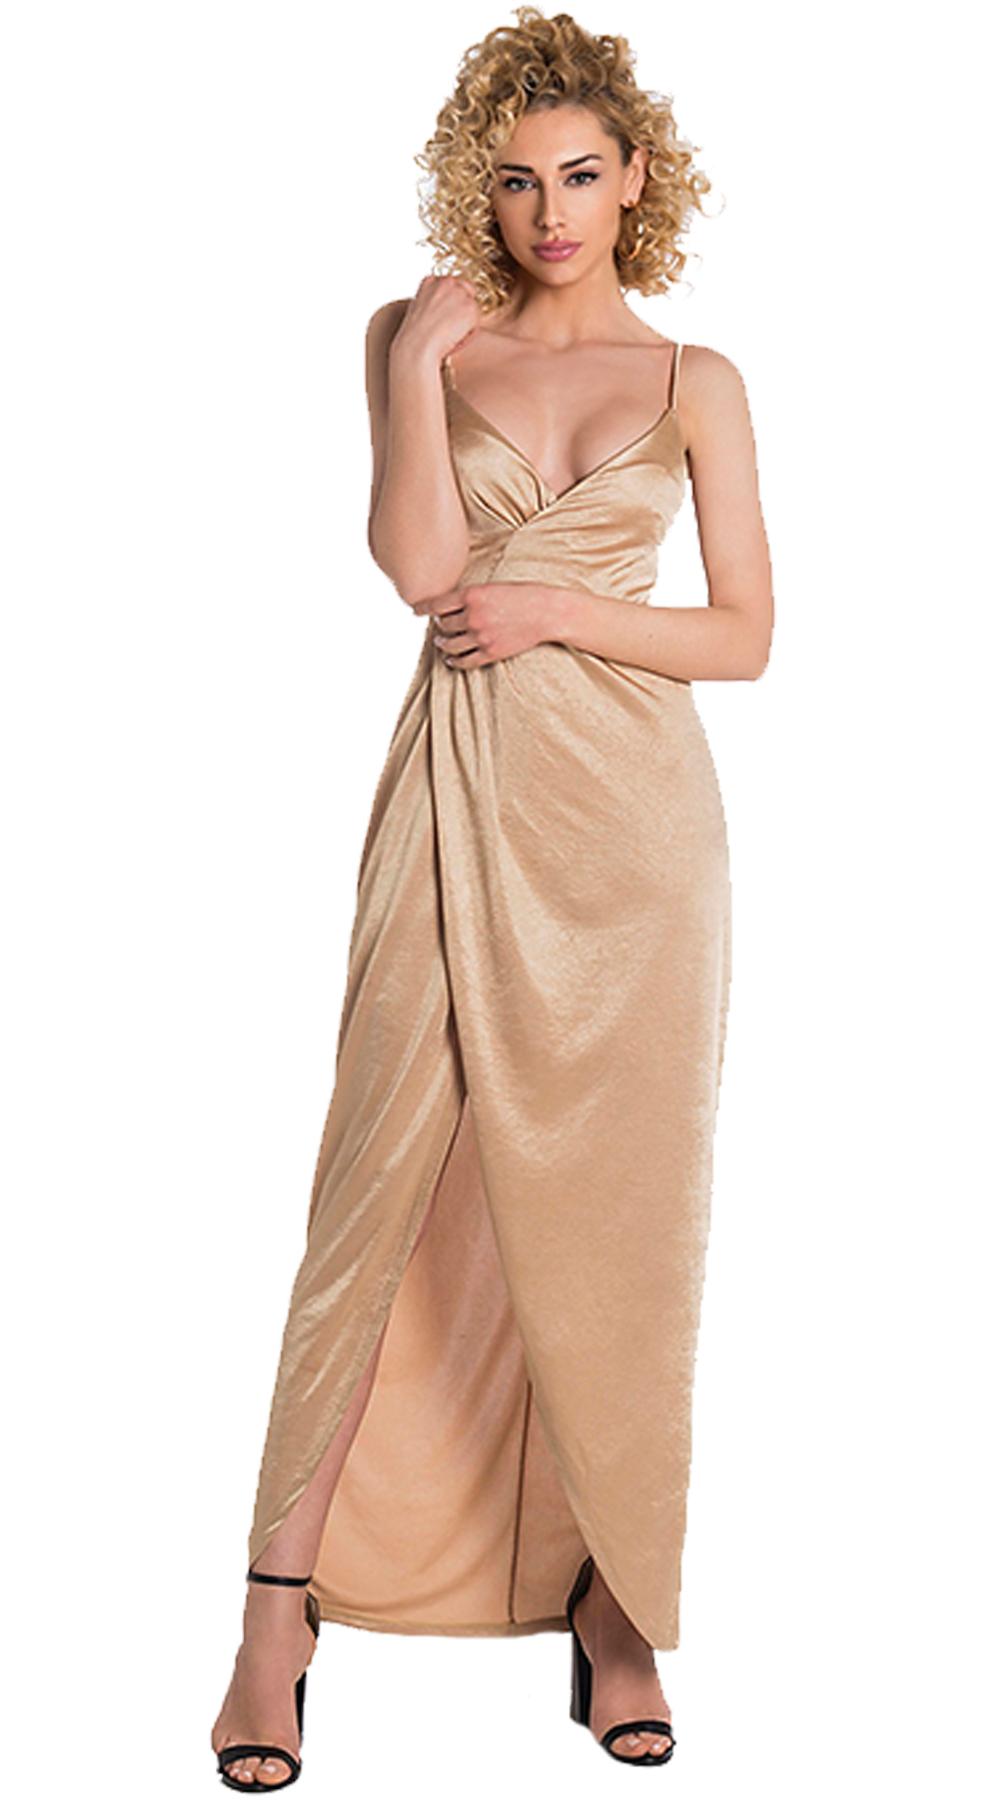 052a96fd6212 ONLINE - Γυναικεία Φορέματα - Σελίδα 4